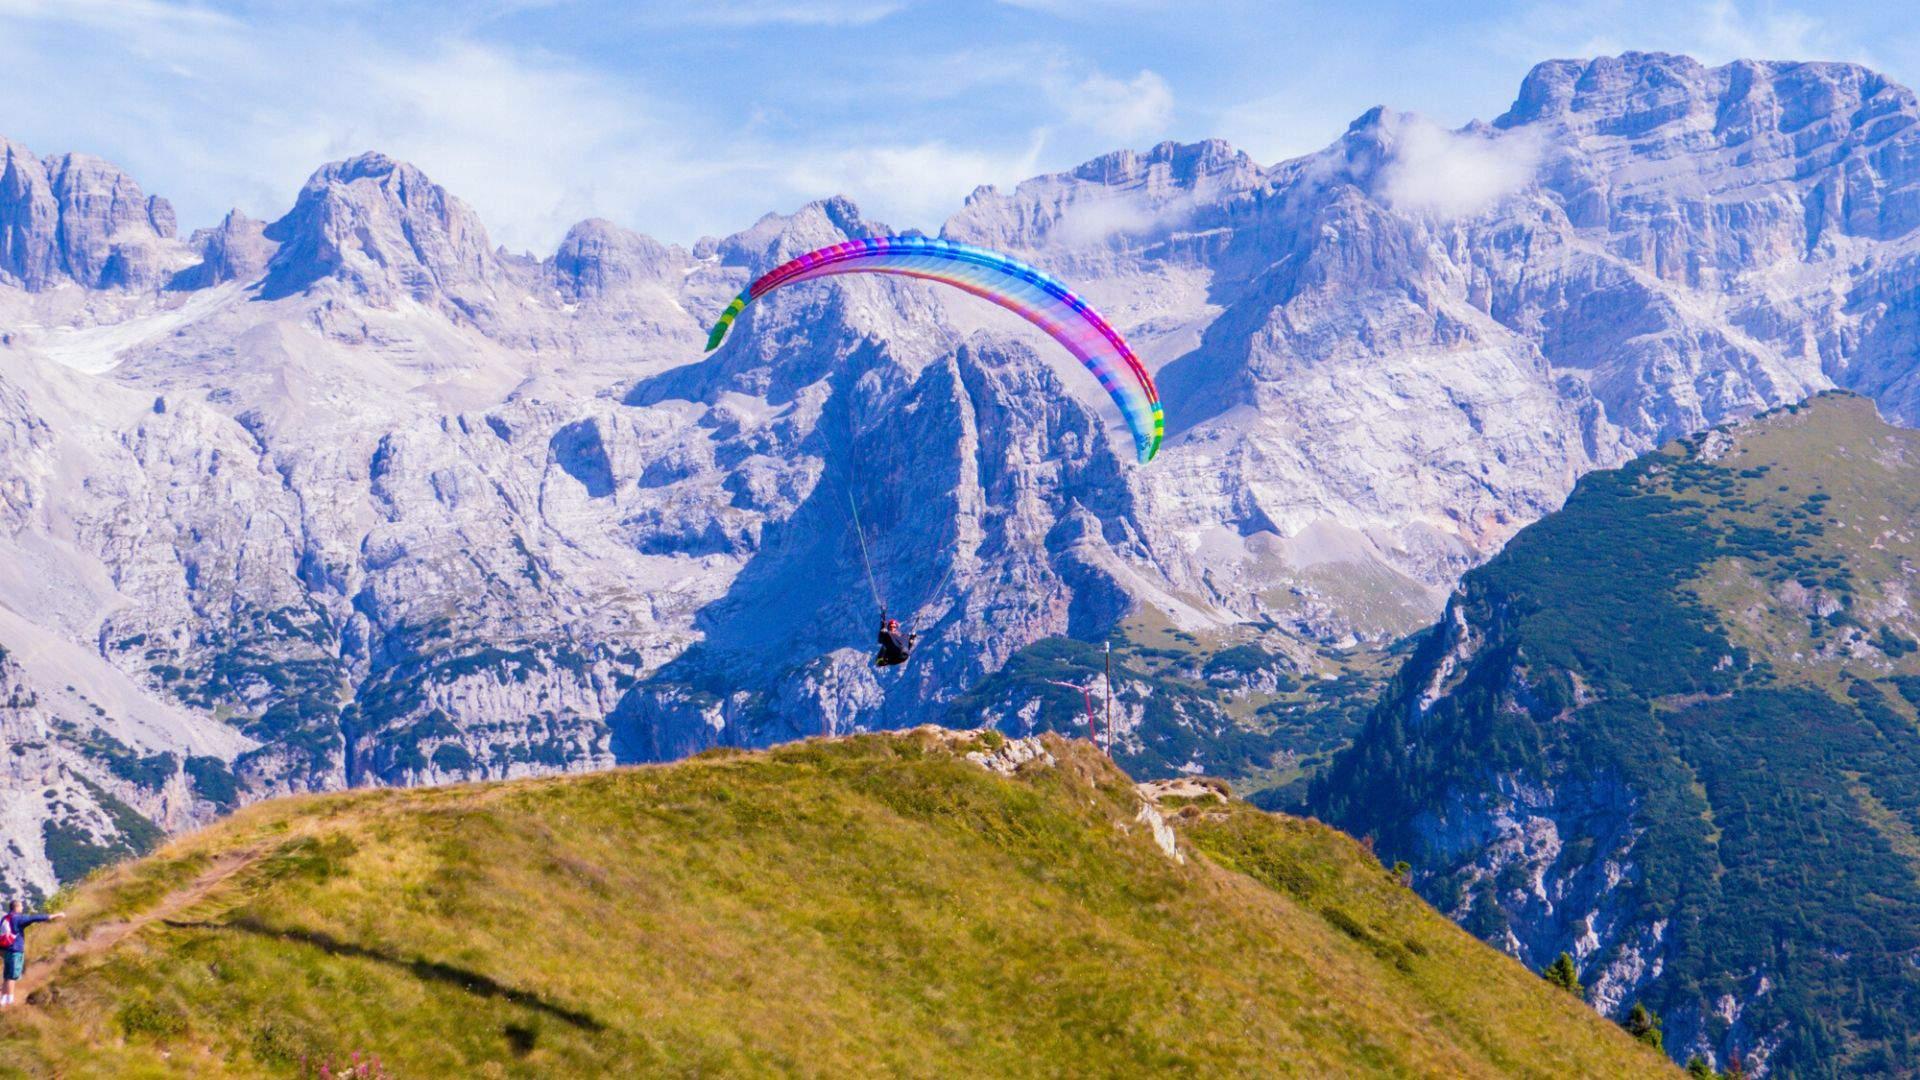 Kalnų vietovėse populiaru skraidyti parasparniu